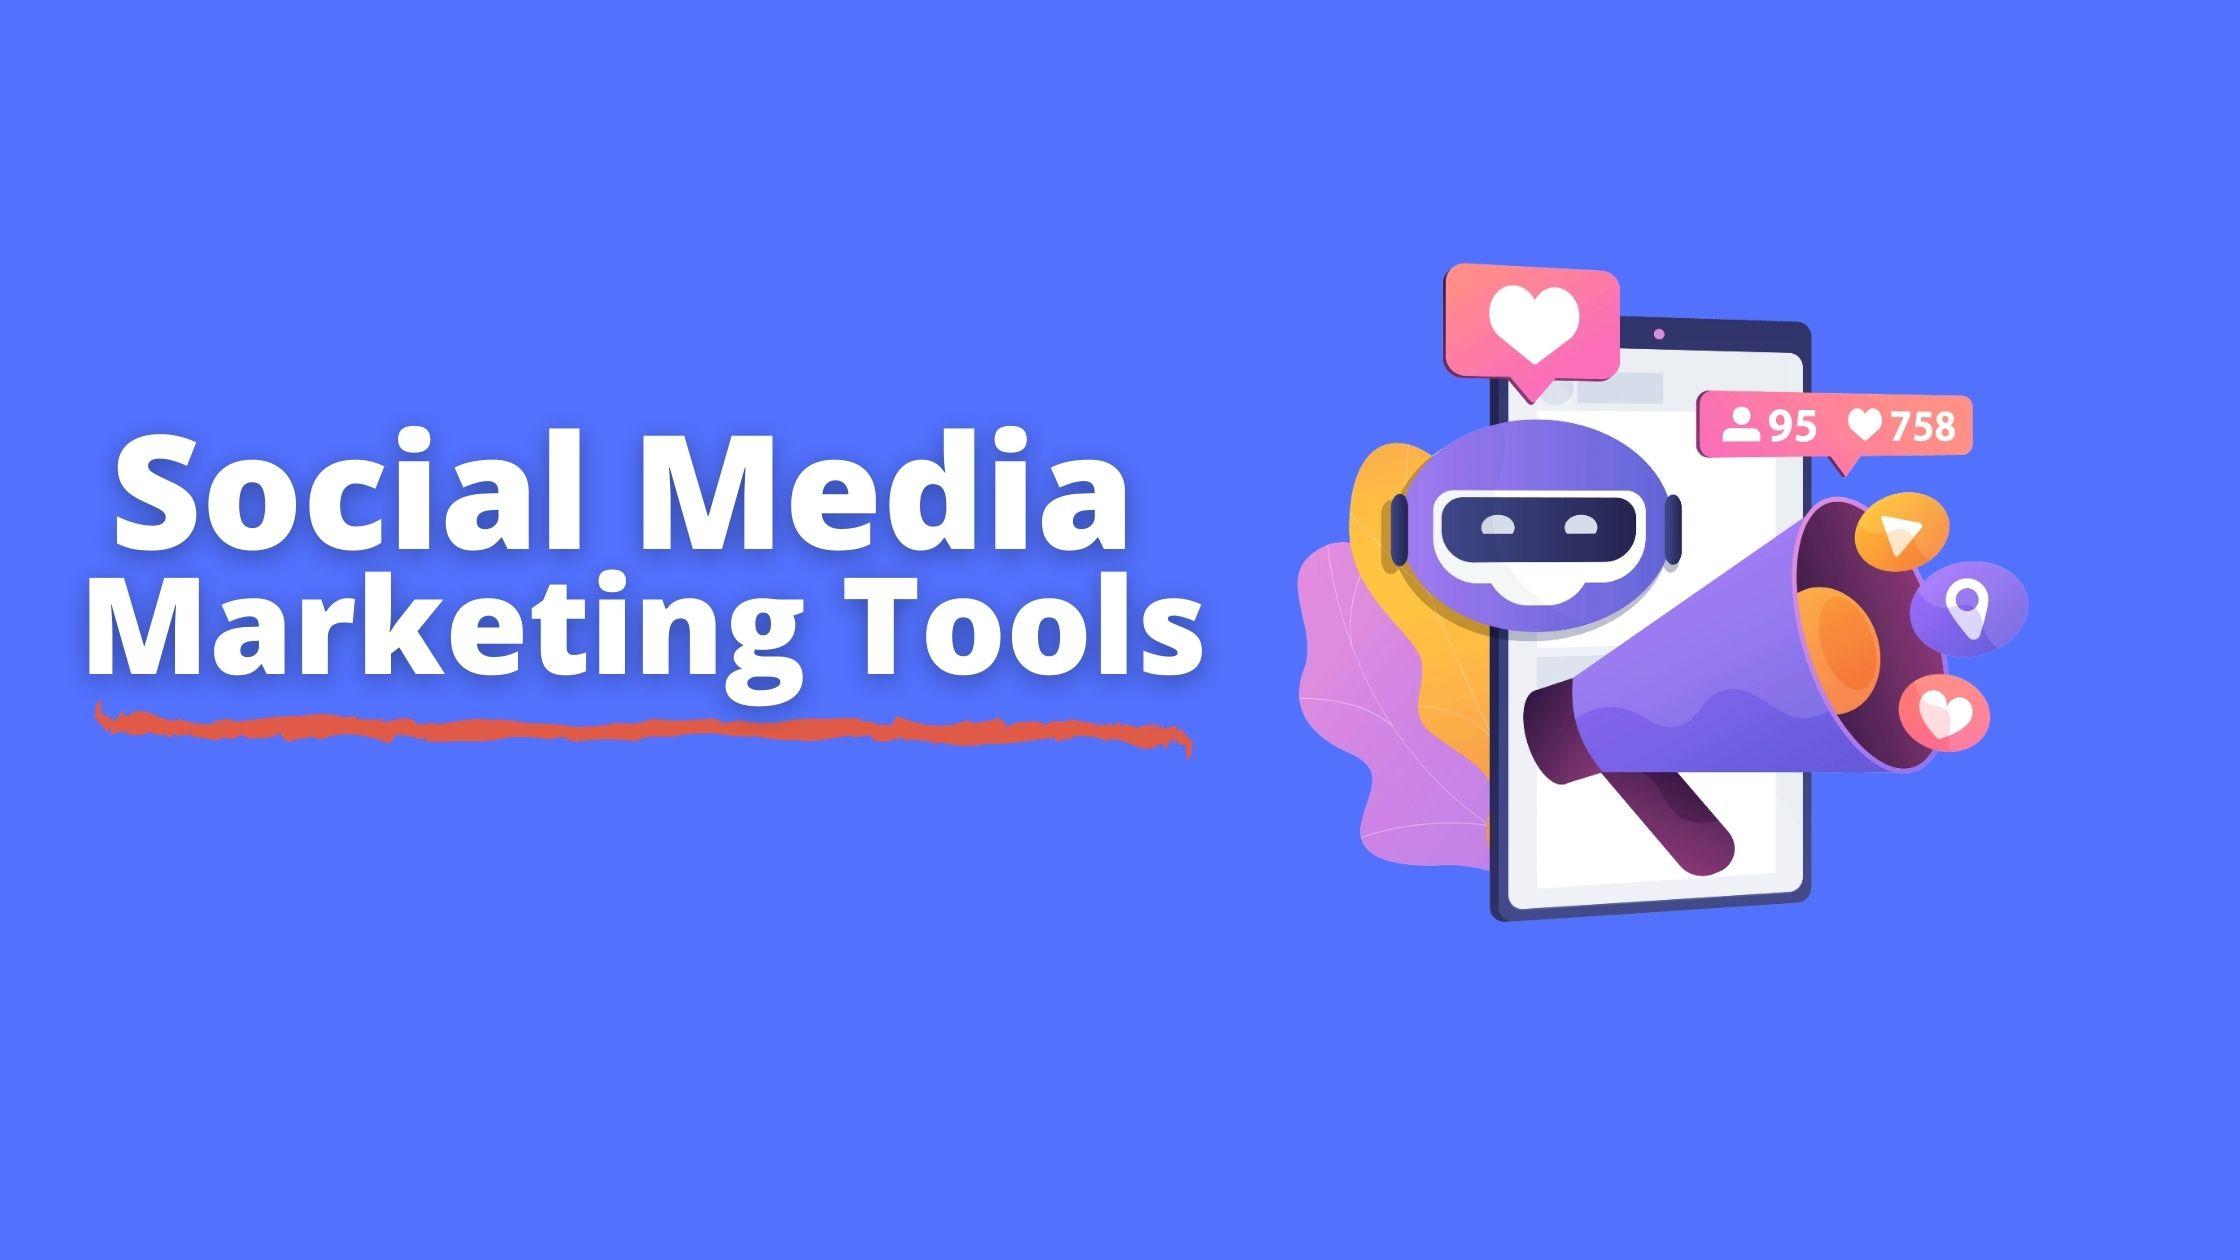 Social Media Marketing Tools To Take Advantage of In 2021